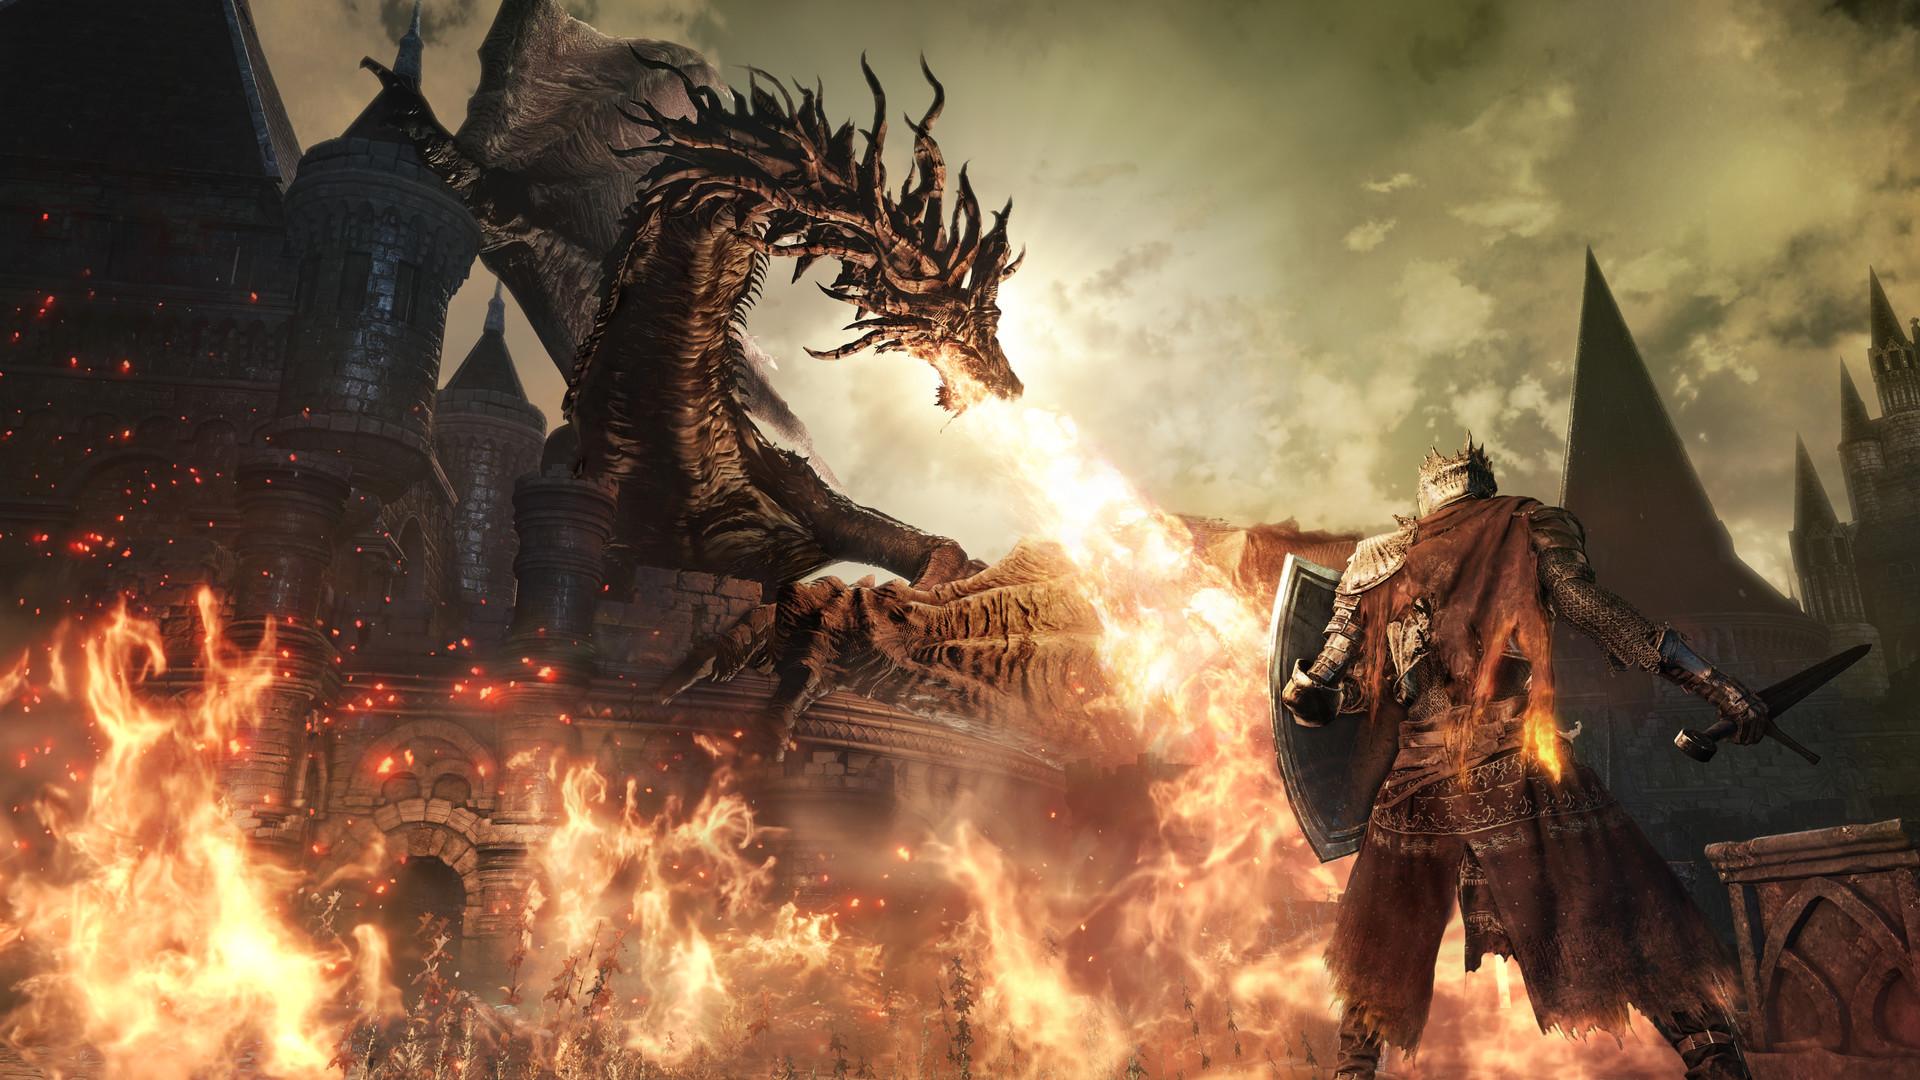 Dark Souls III image 1